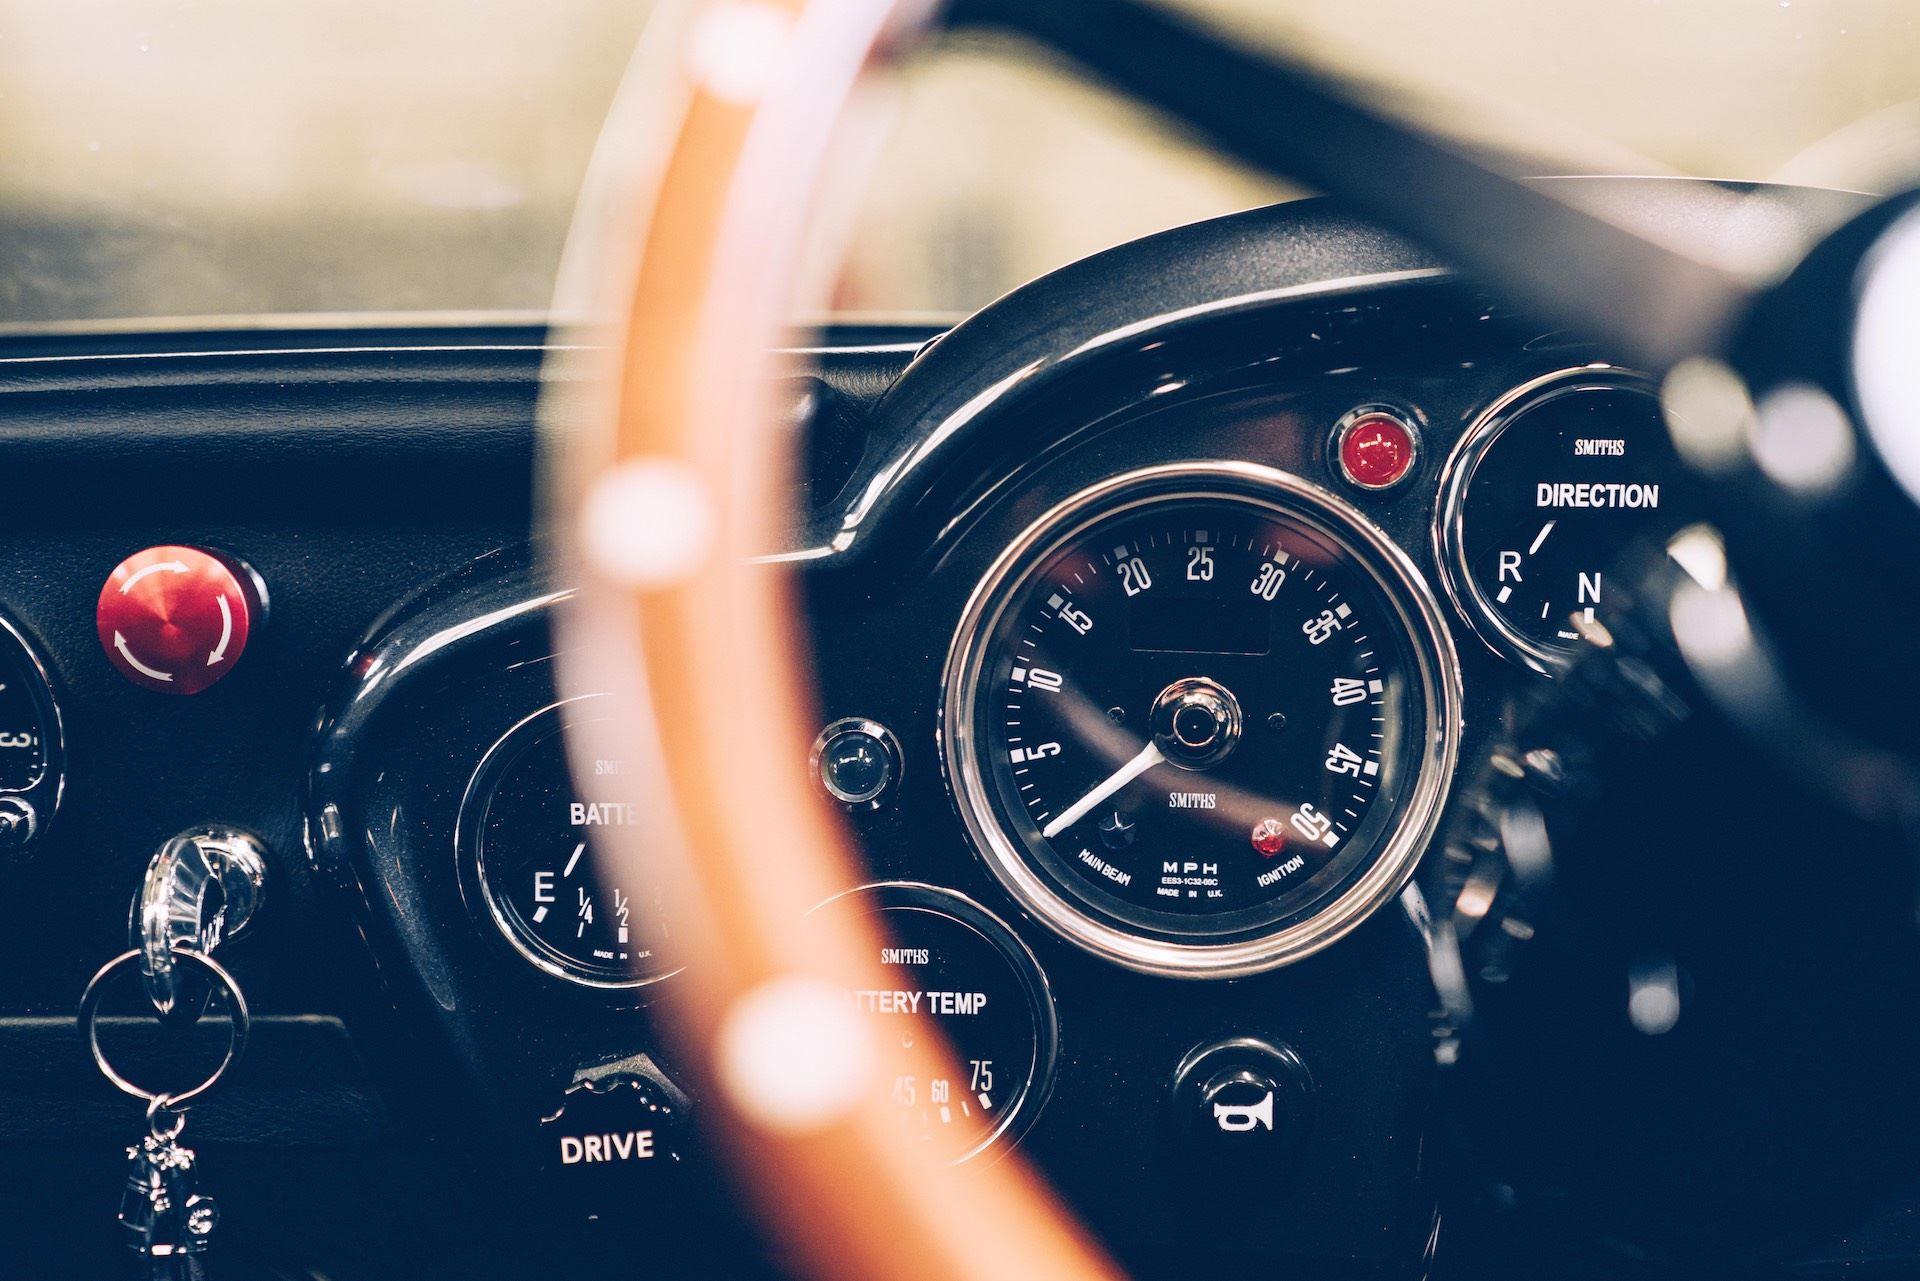 Aston-Martin-DB5-Junior-James-Bond-Edition-9